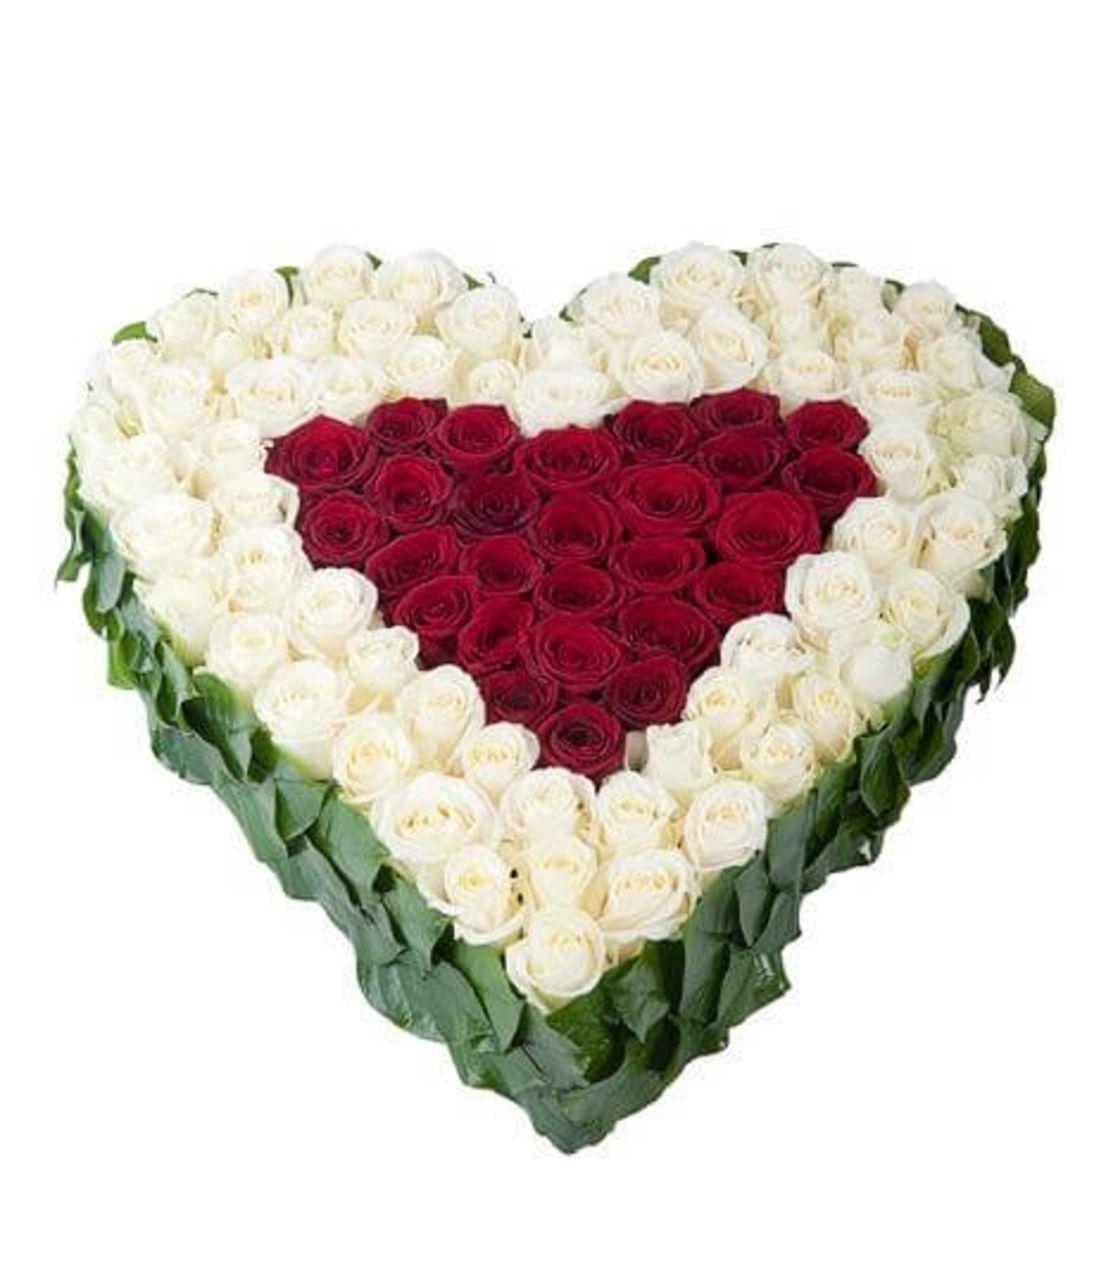 Серце з 101 троянди. Superflowers.com.ua